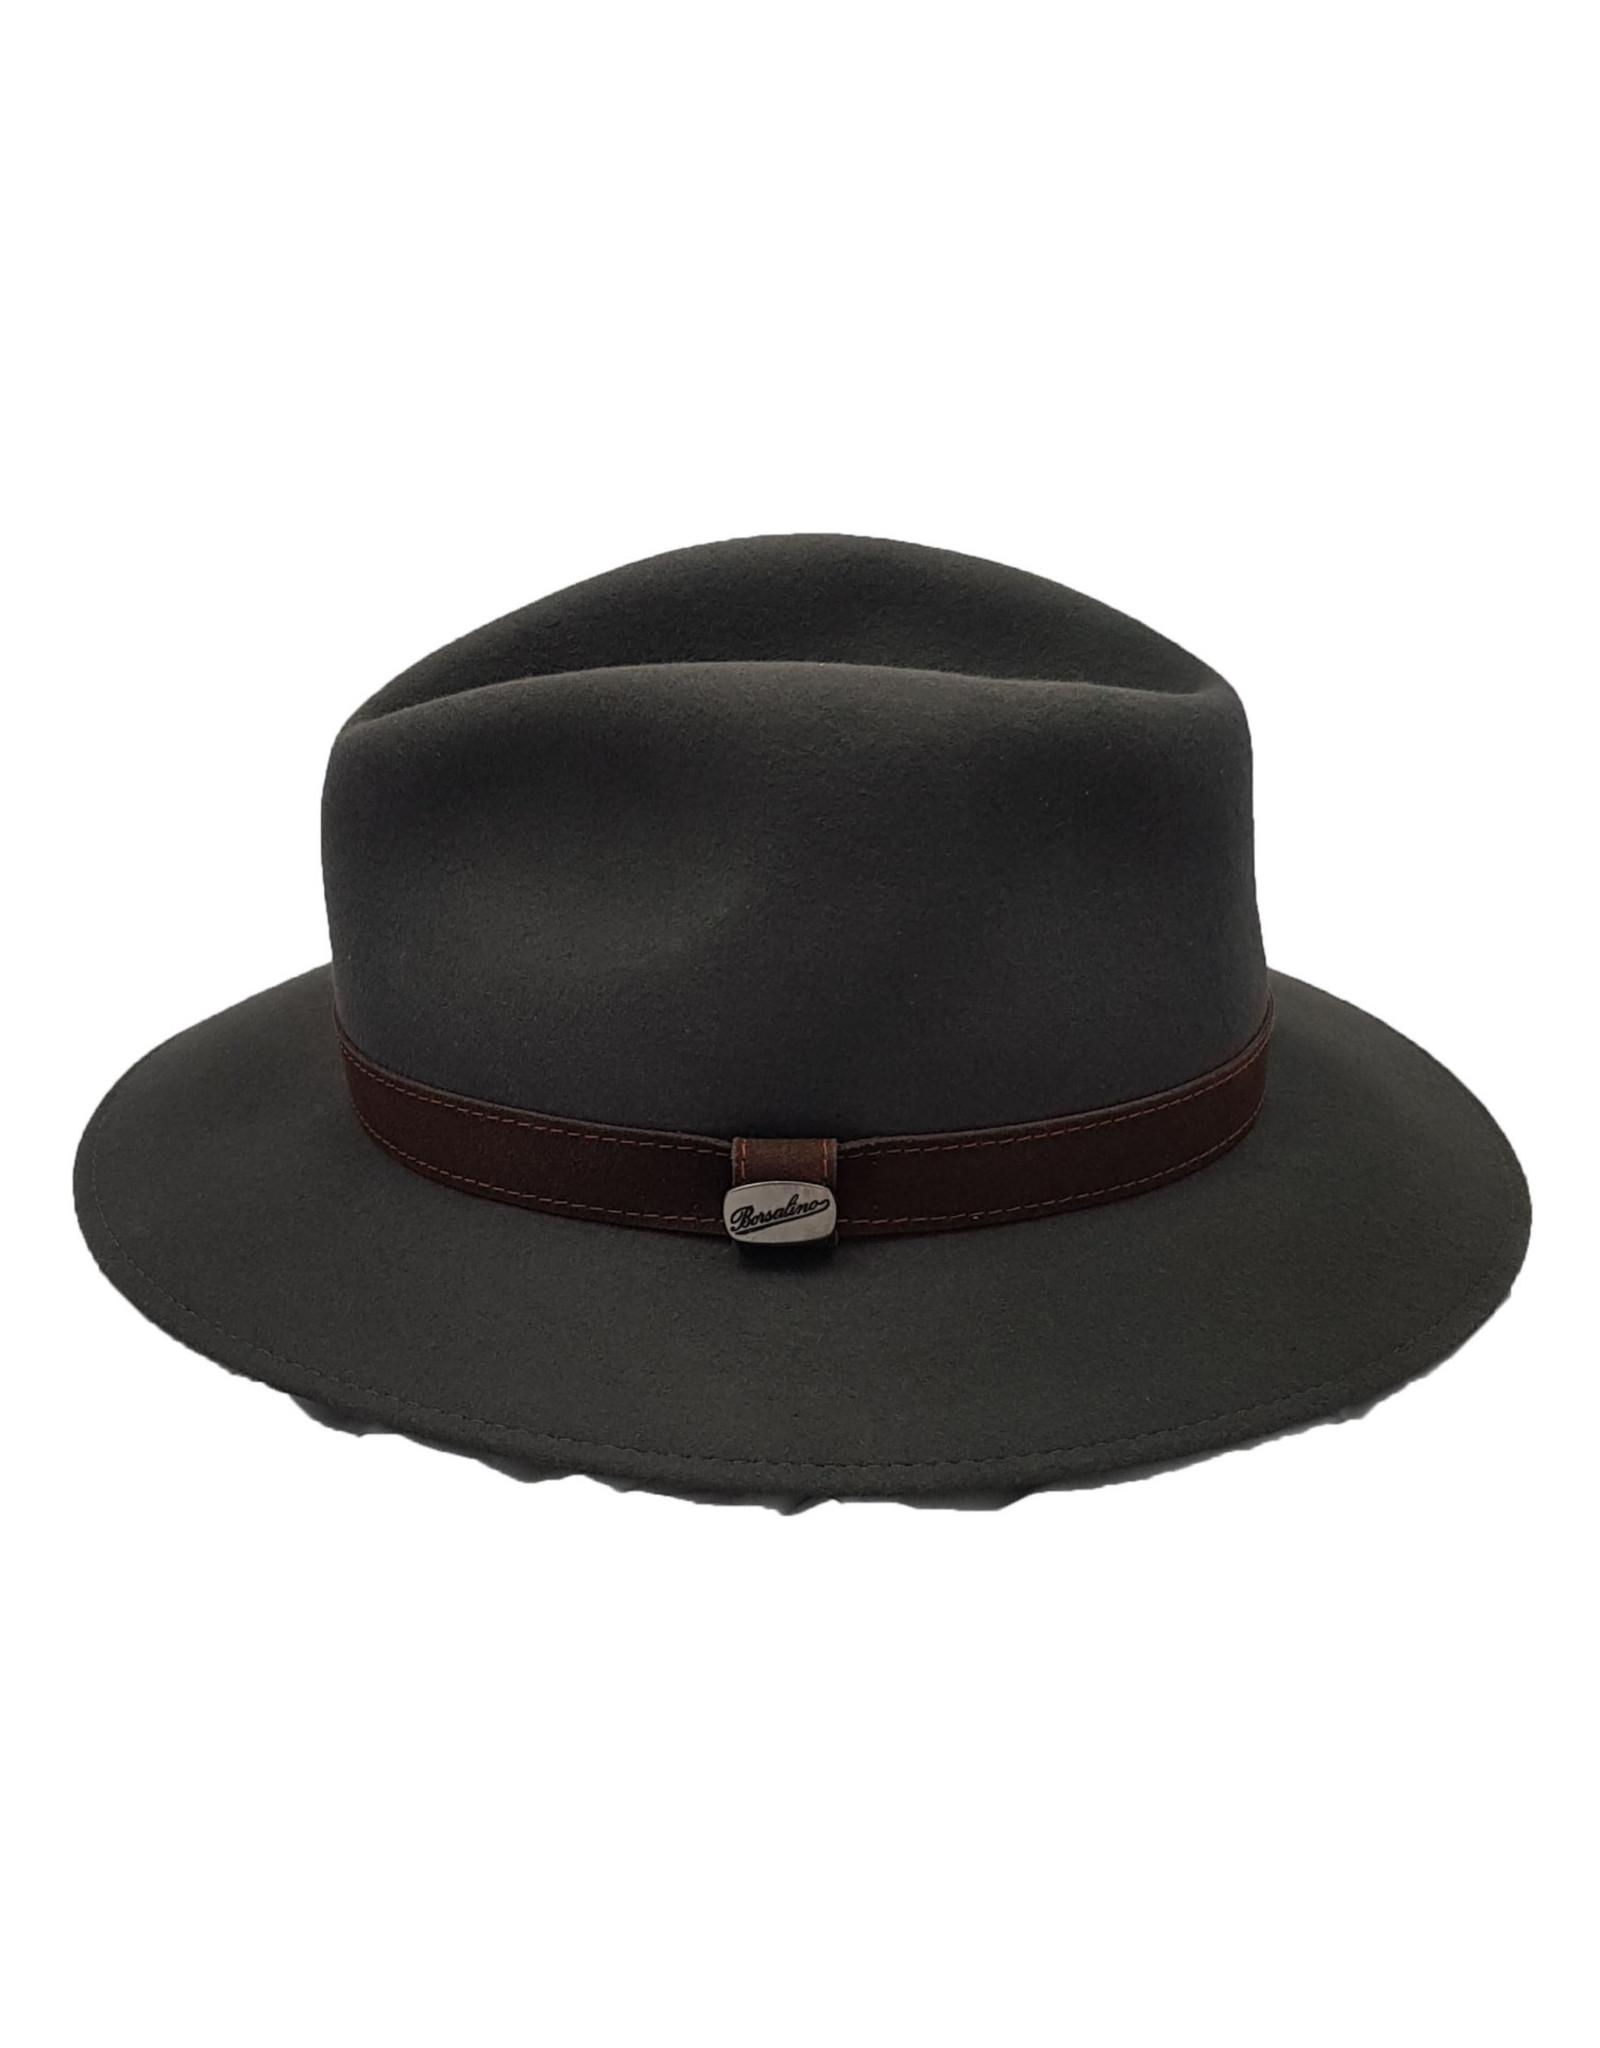 Borsalino Borsalino hoed groen 390060